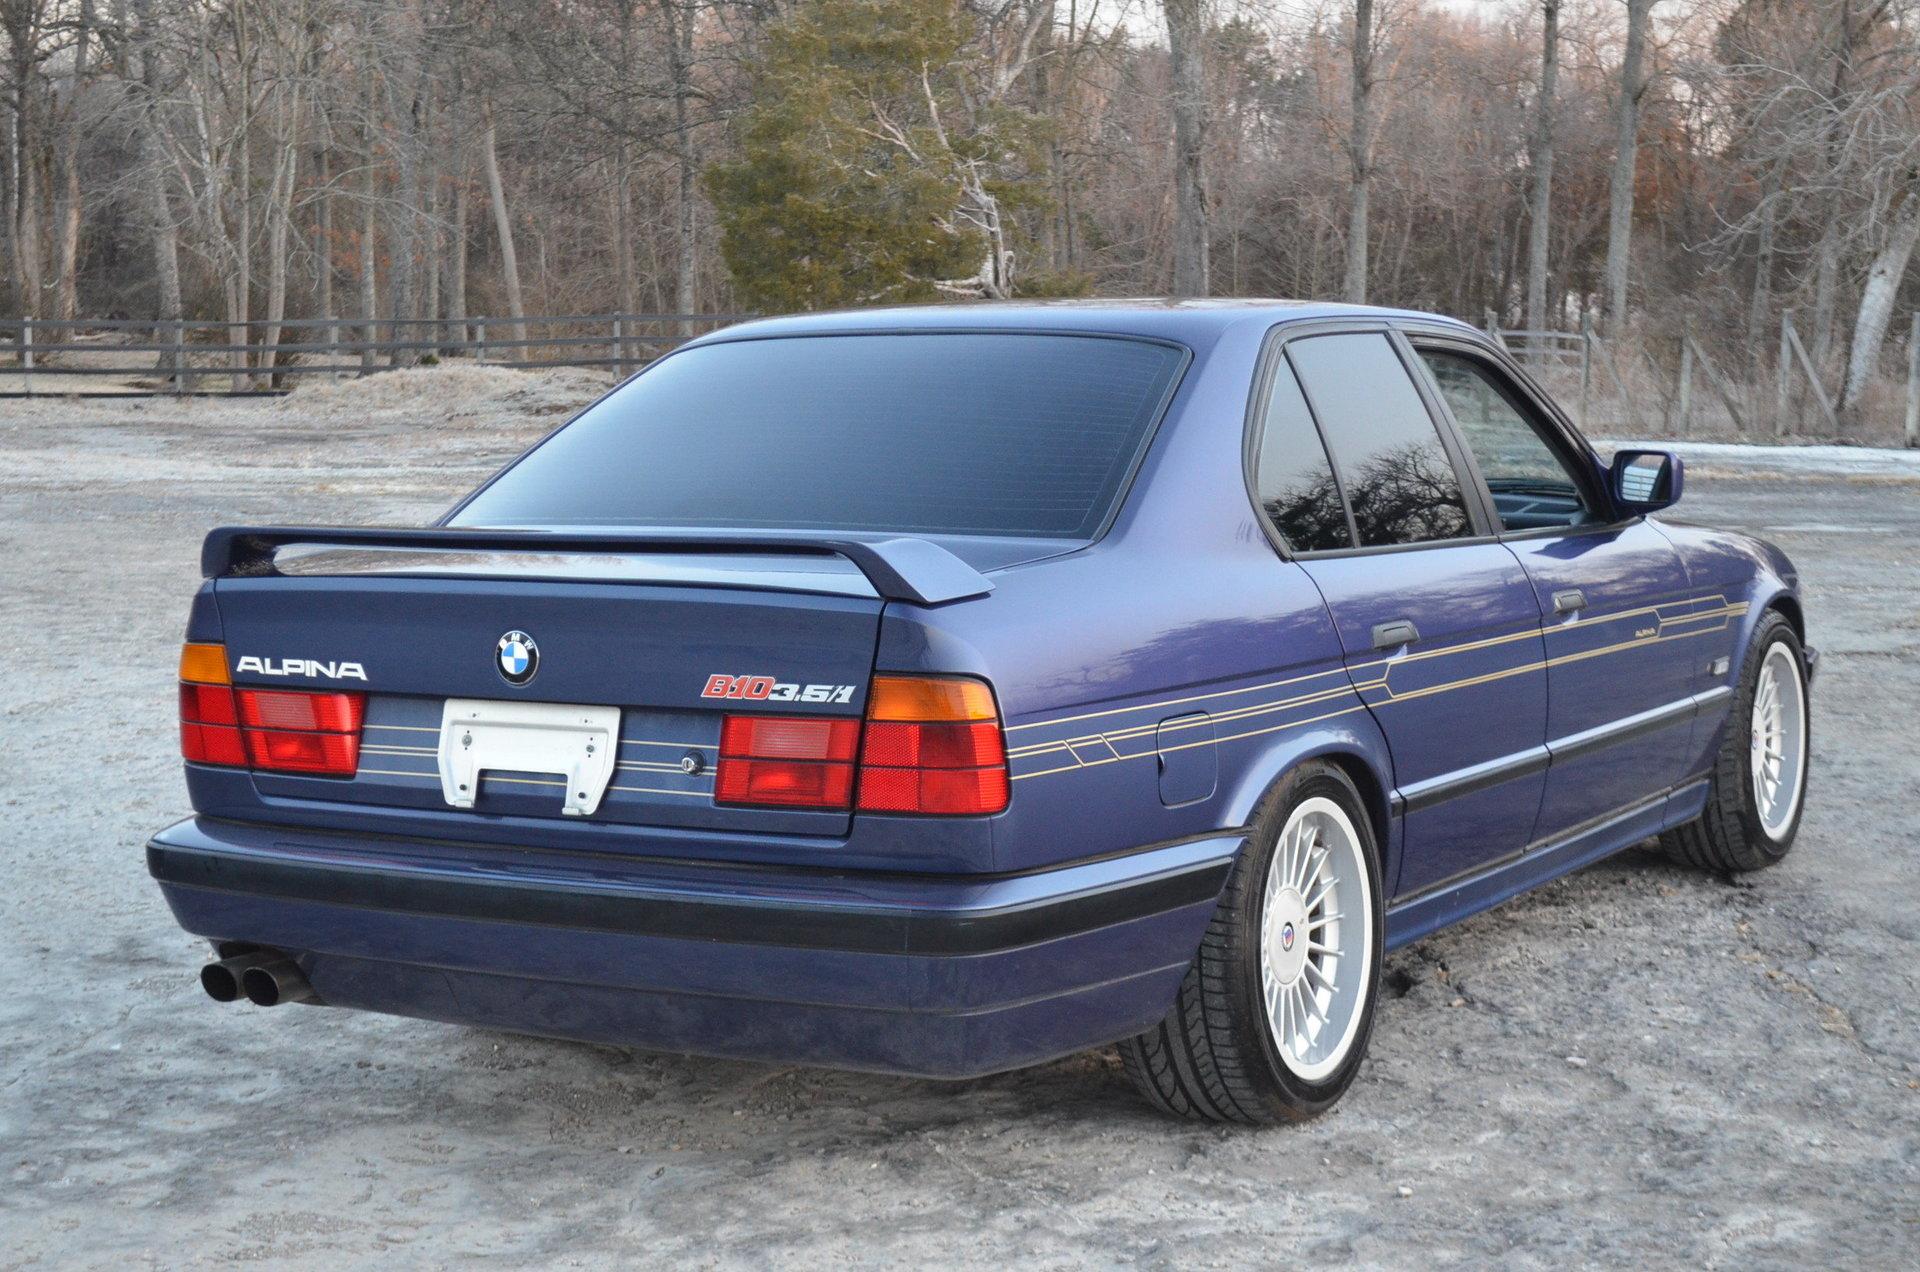 1989 Bmw Alpina B10 For Sale 80221 Mcg